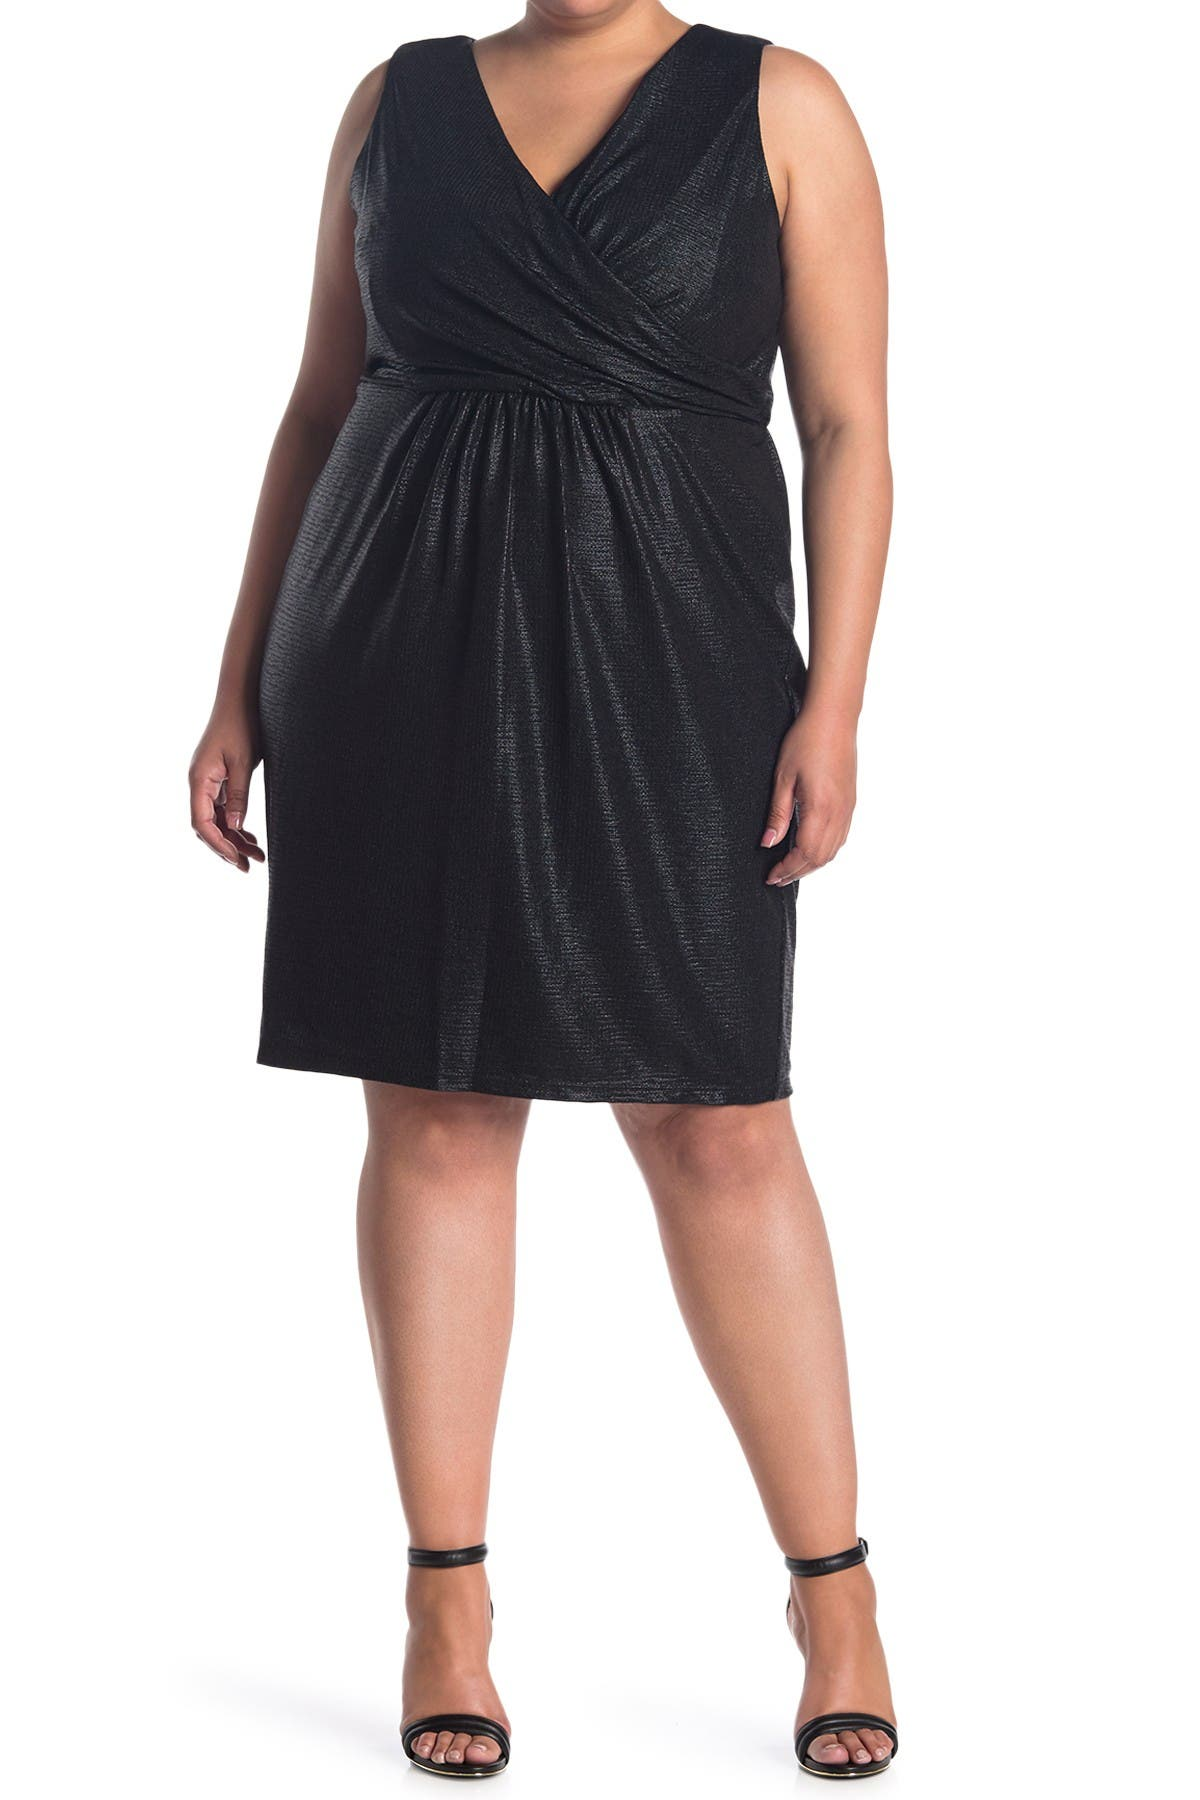 Image of Donna Ricco Surplice Sleeveless Metallic Dress